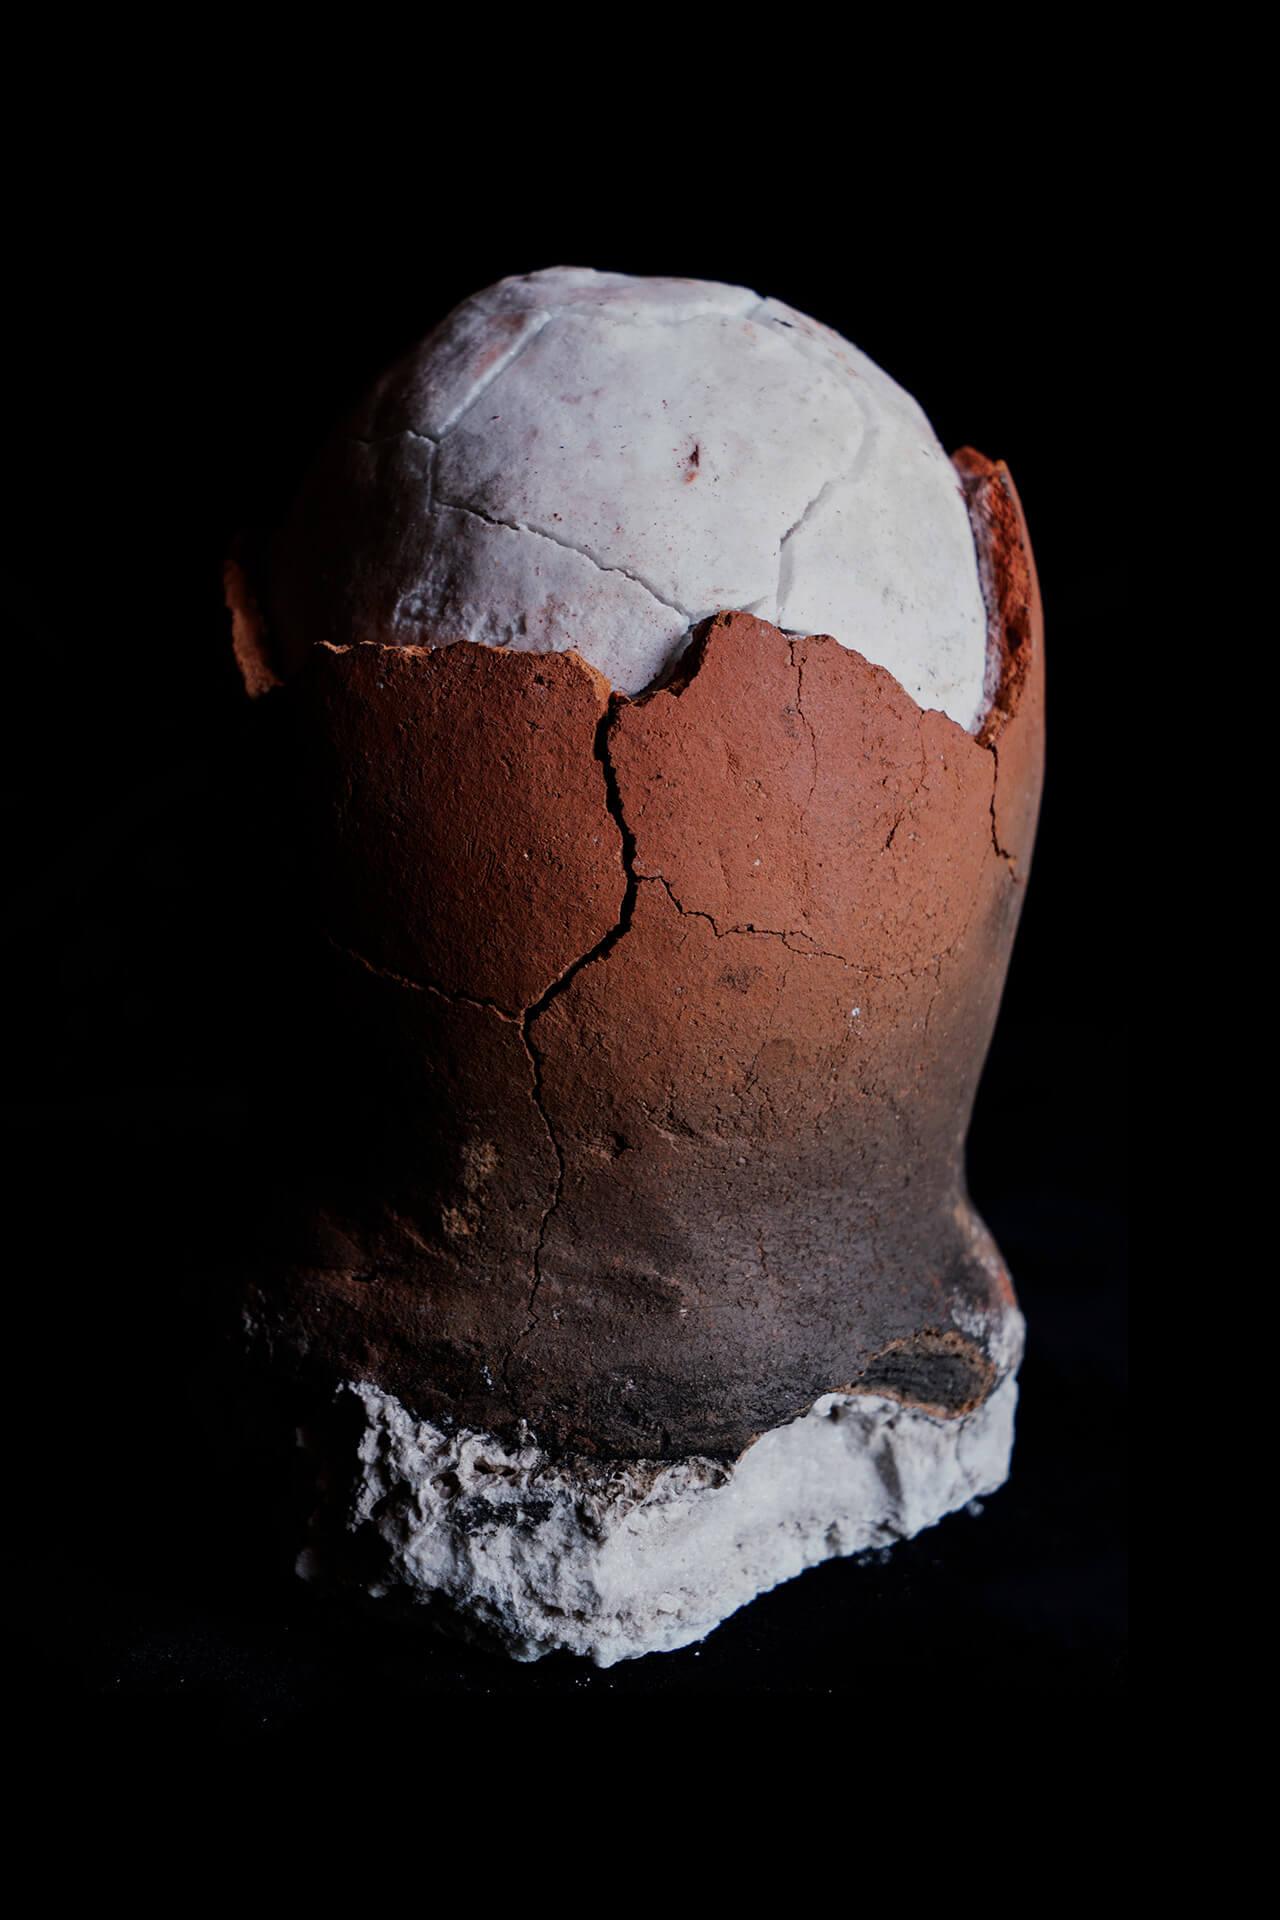 Asin Tibuok, the unbroken salt eggs of Albur, Bohol